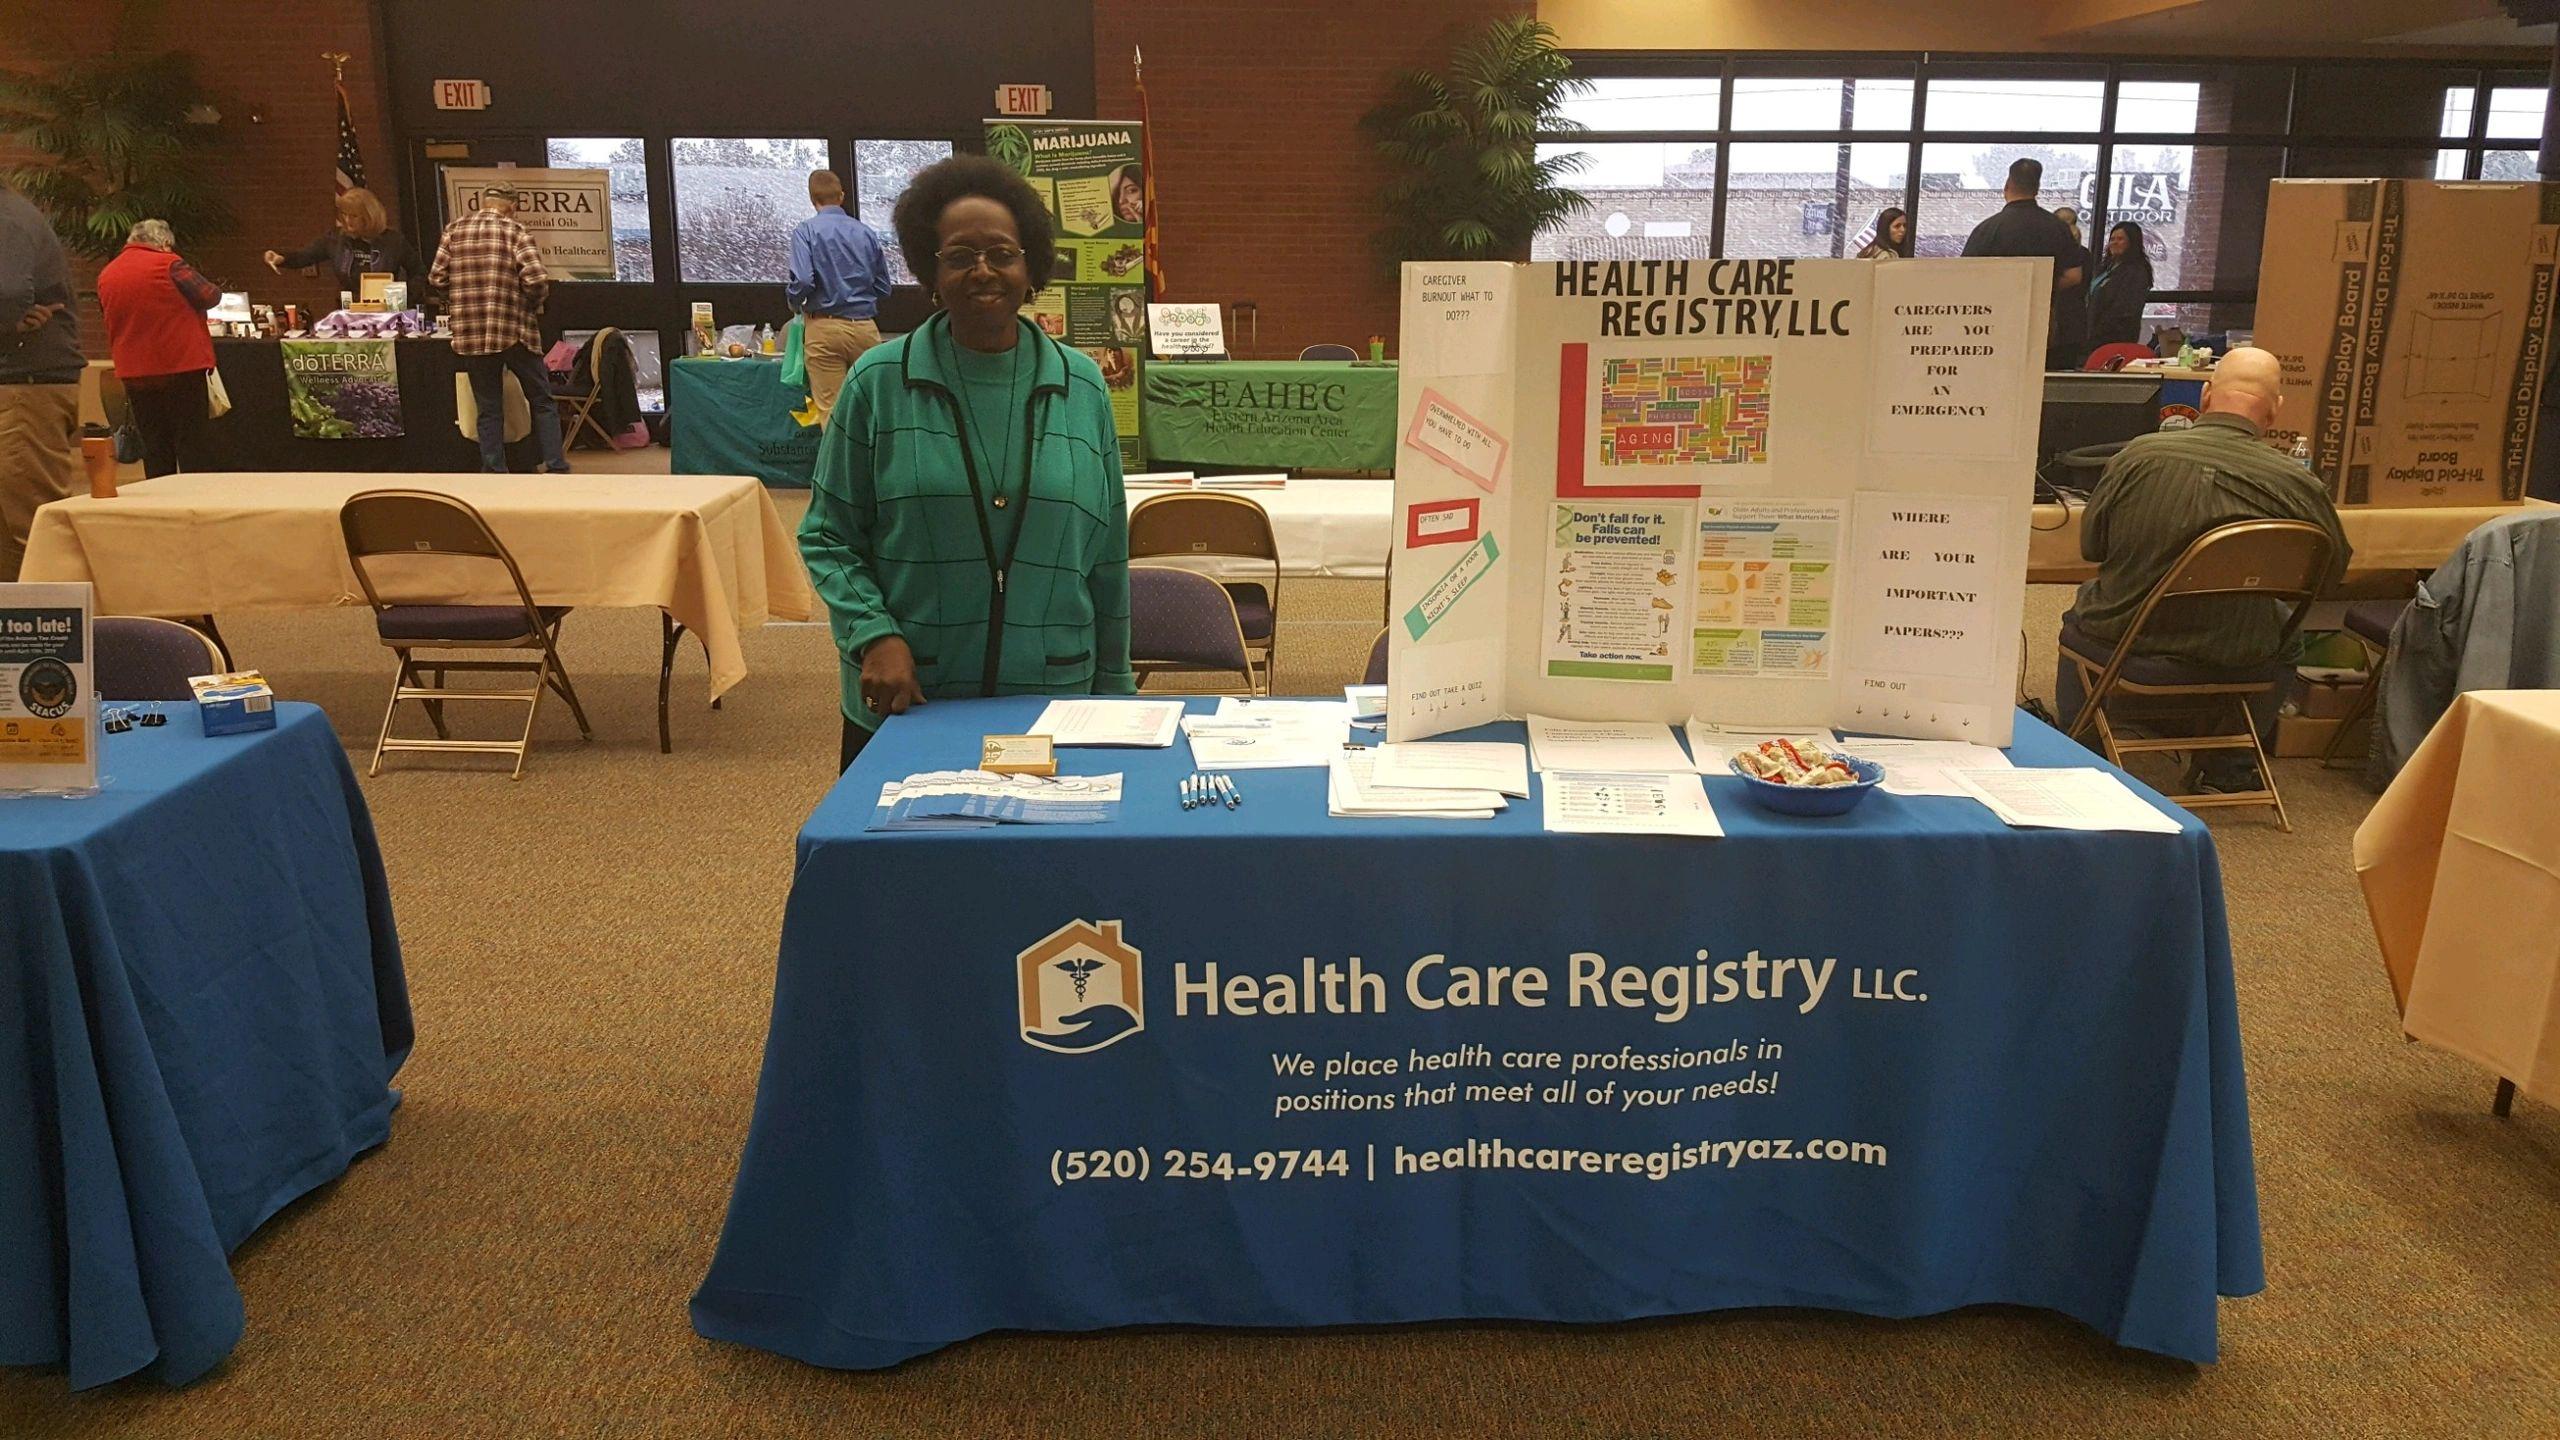 Health Care Registry LLC logo